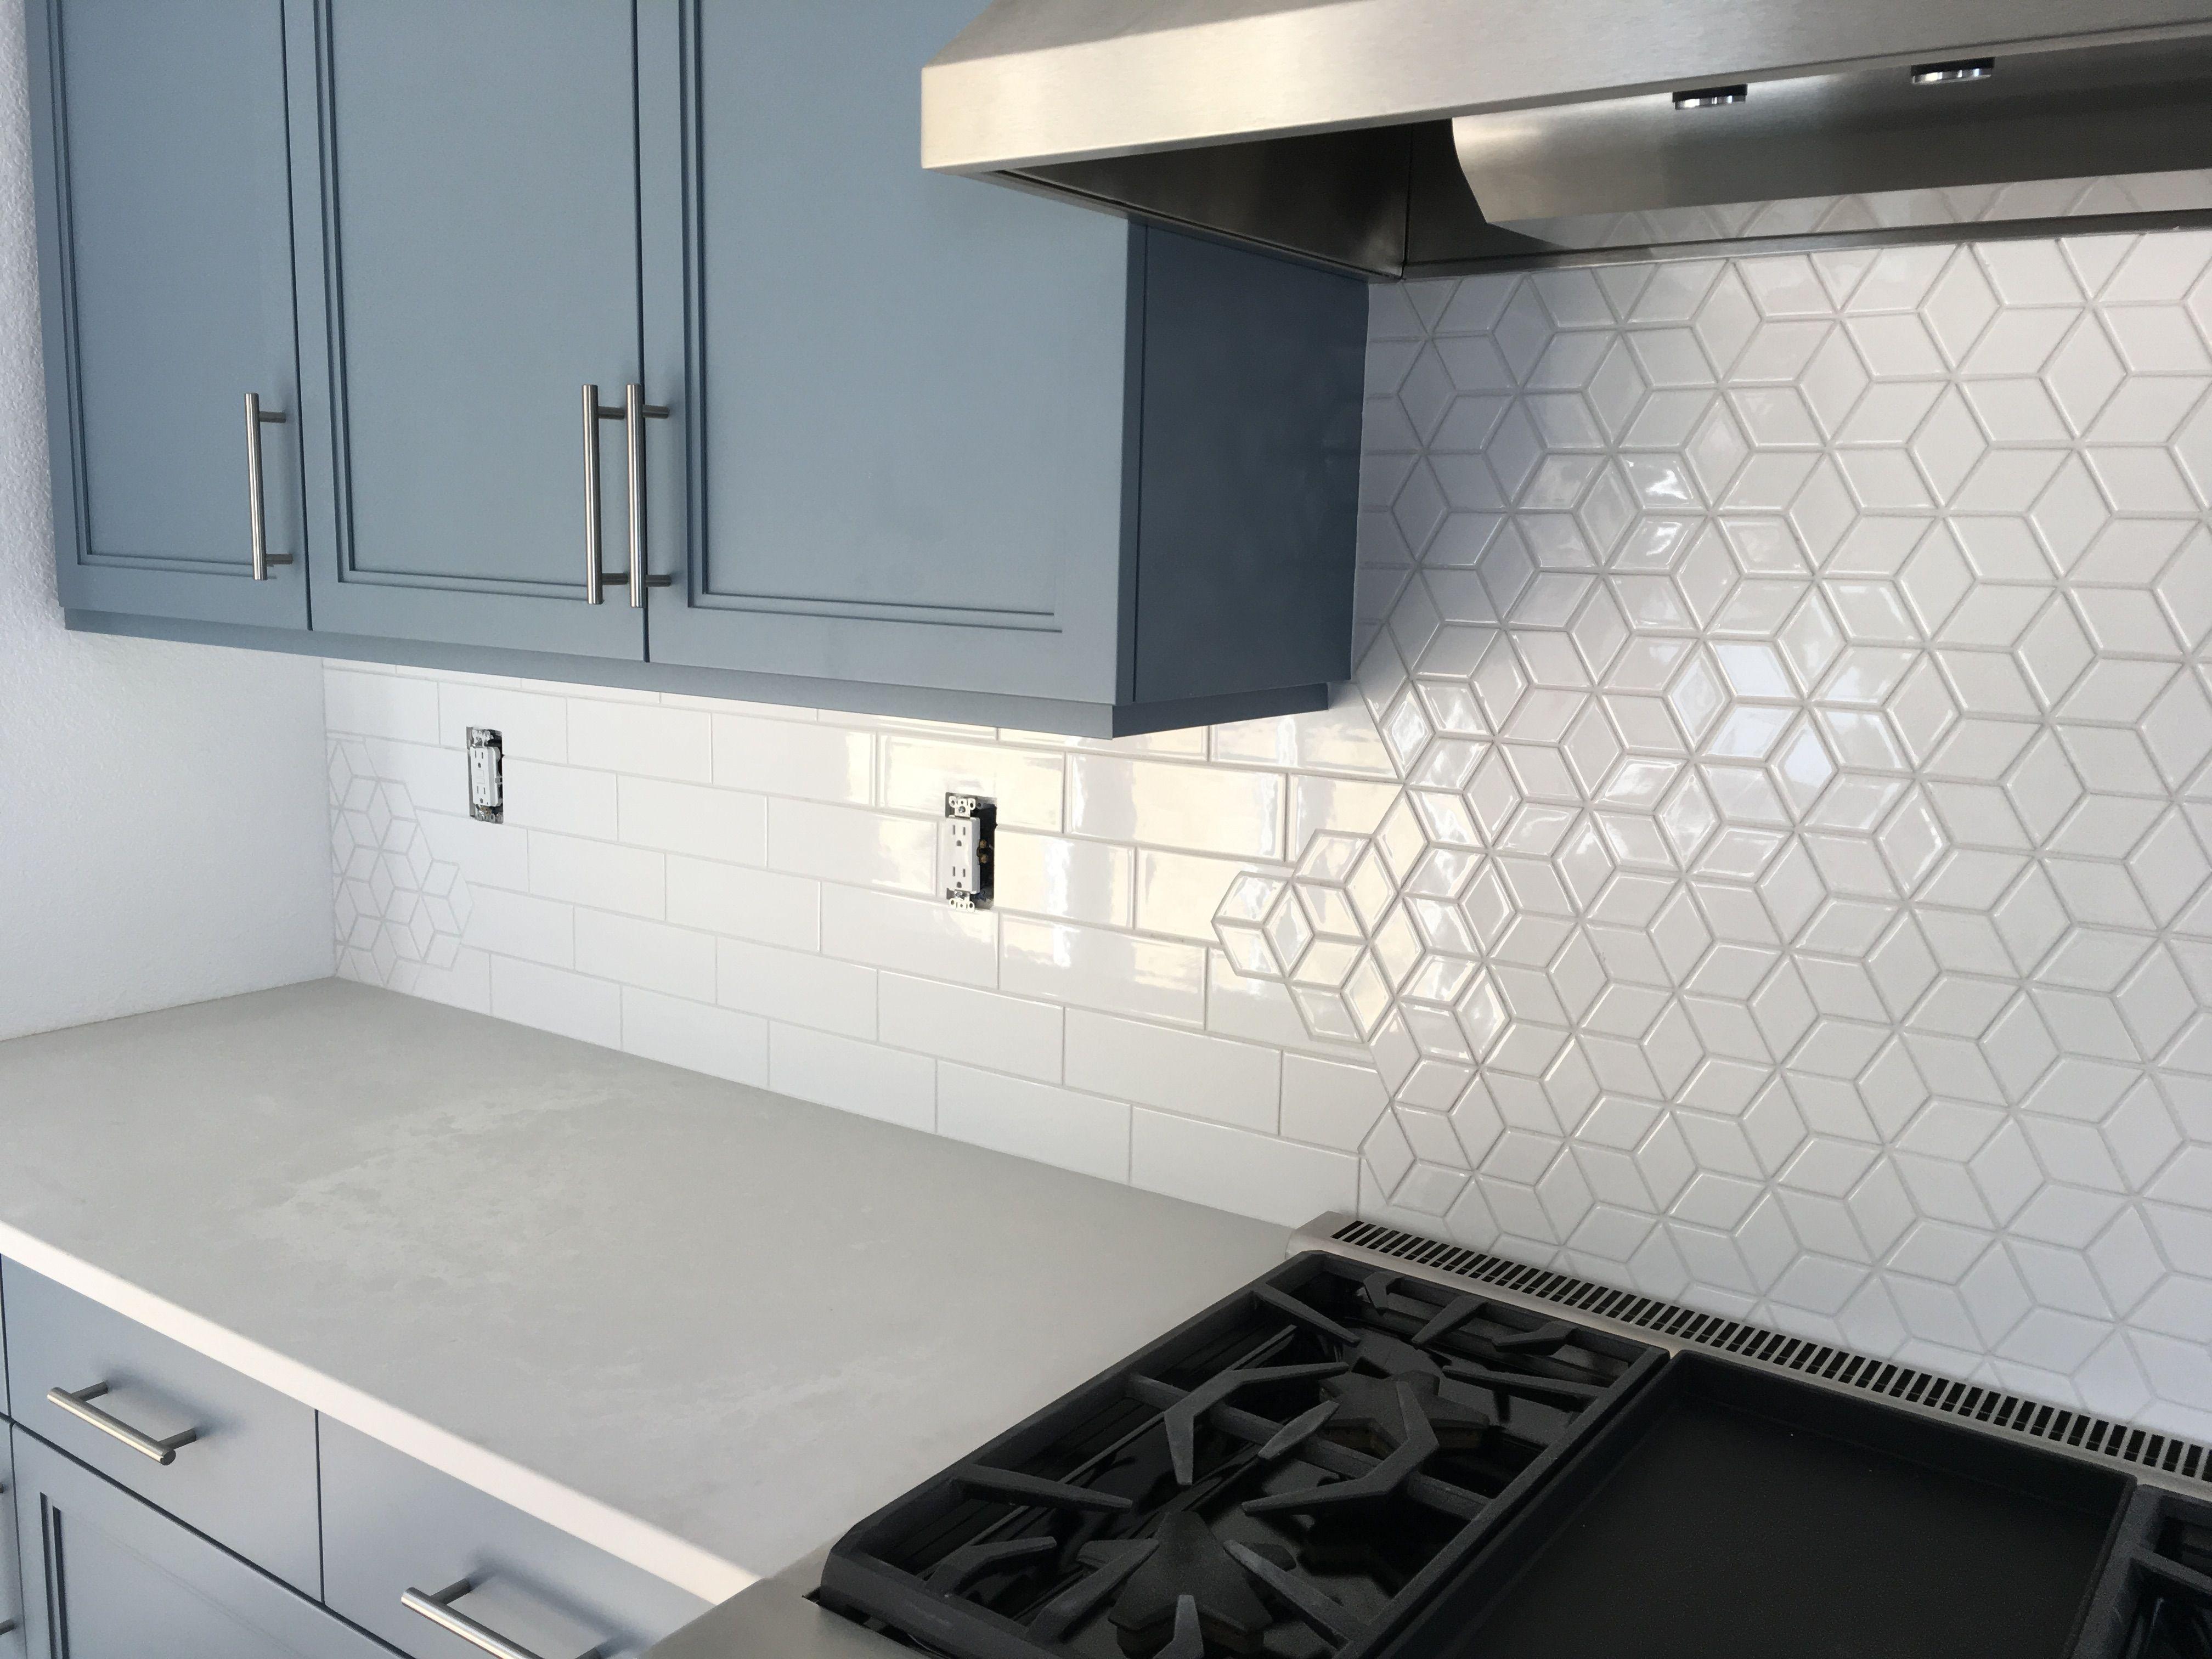 kitchen backsplash with a combination